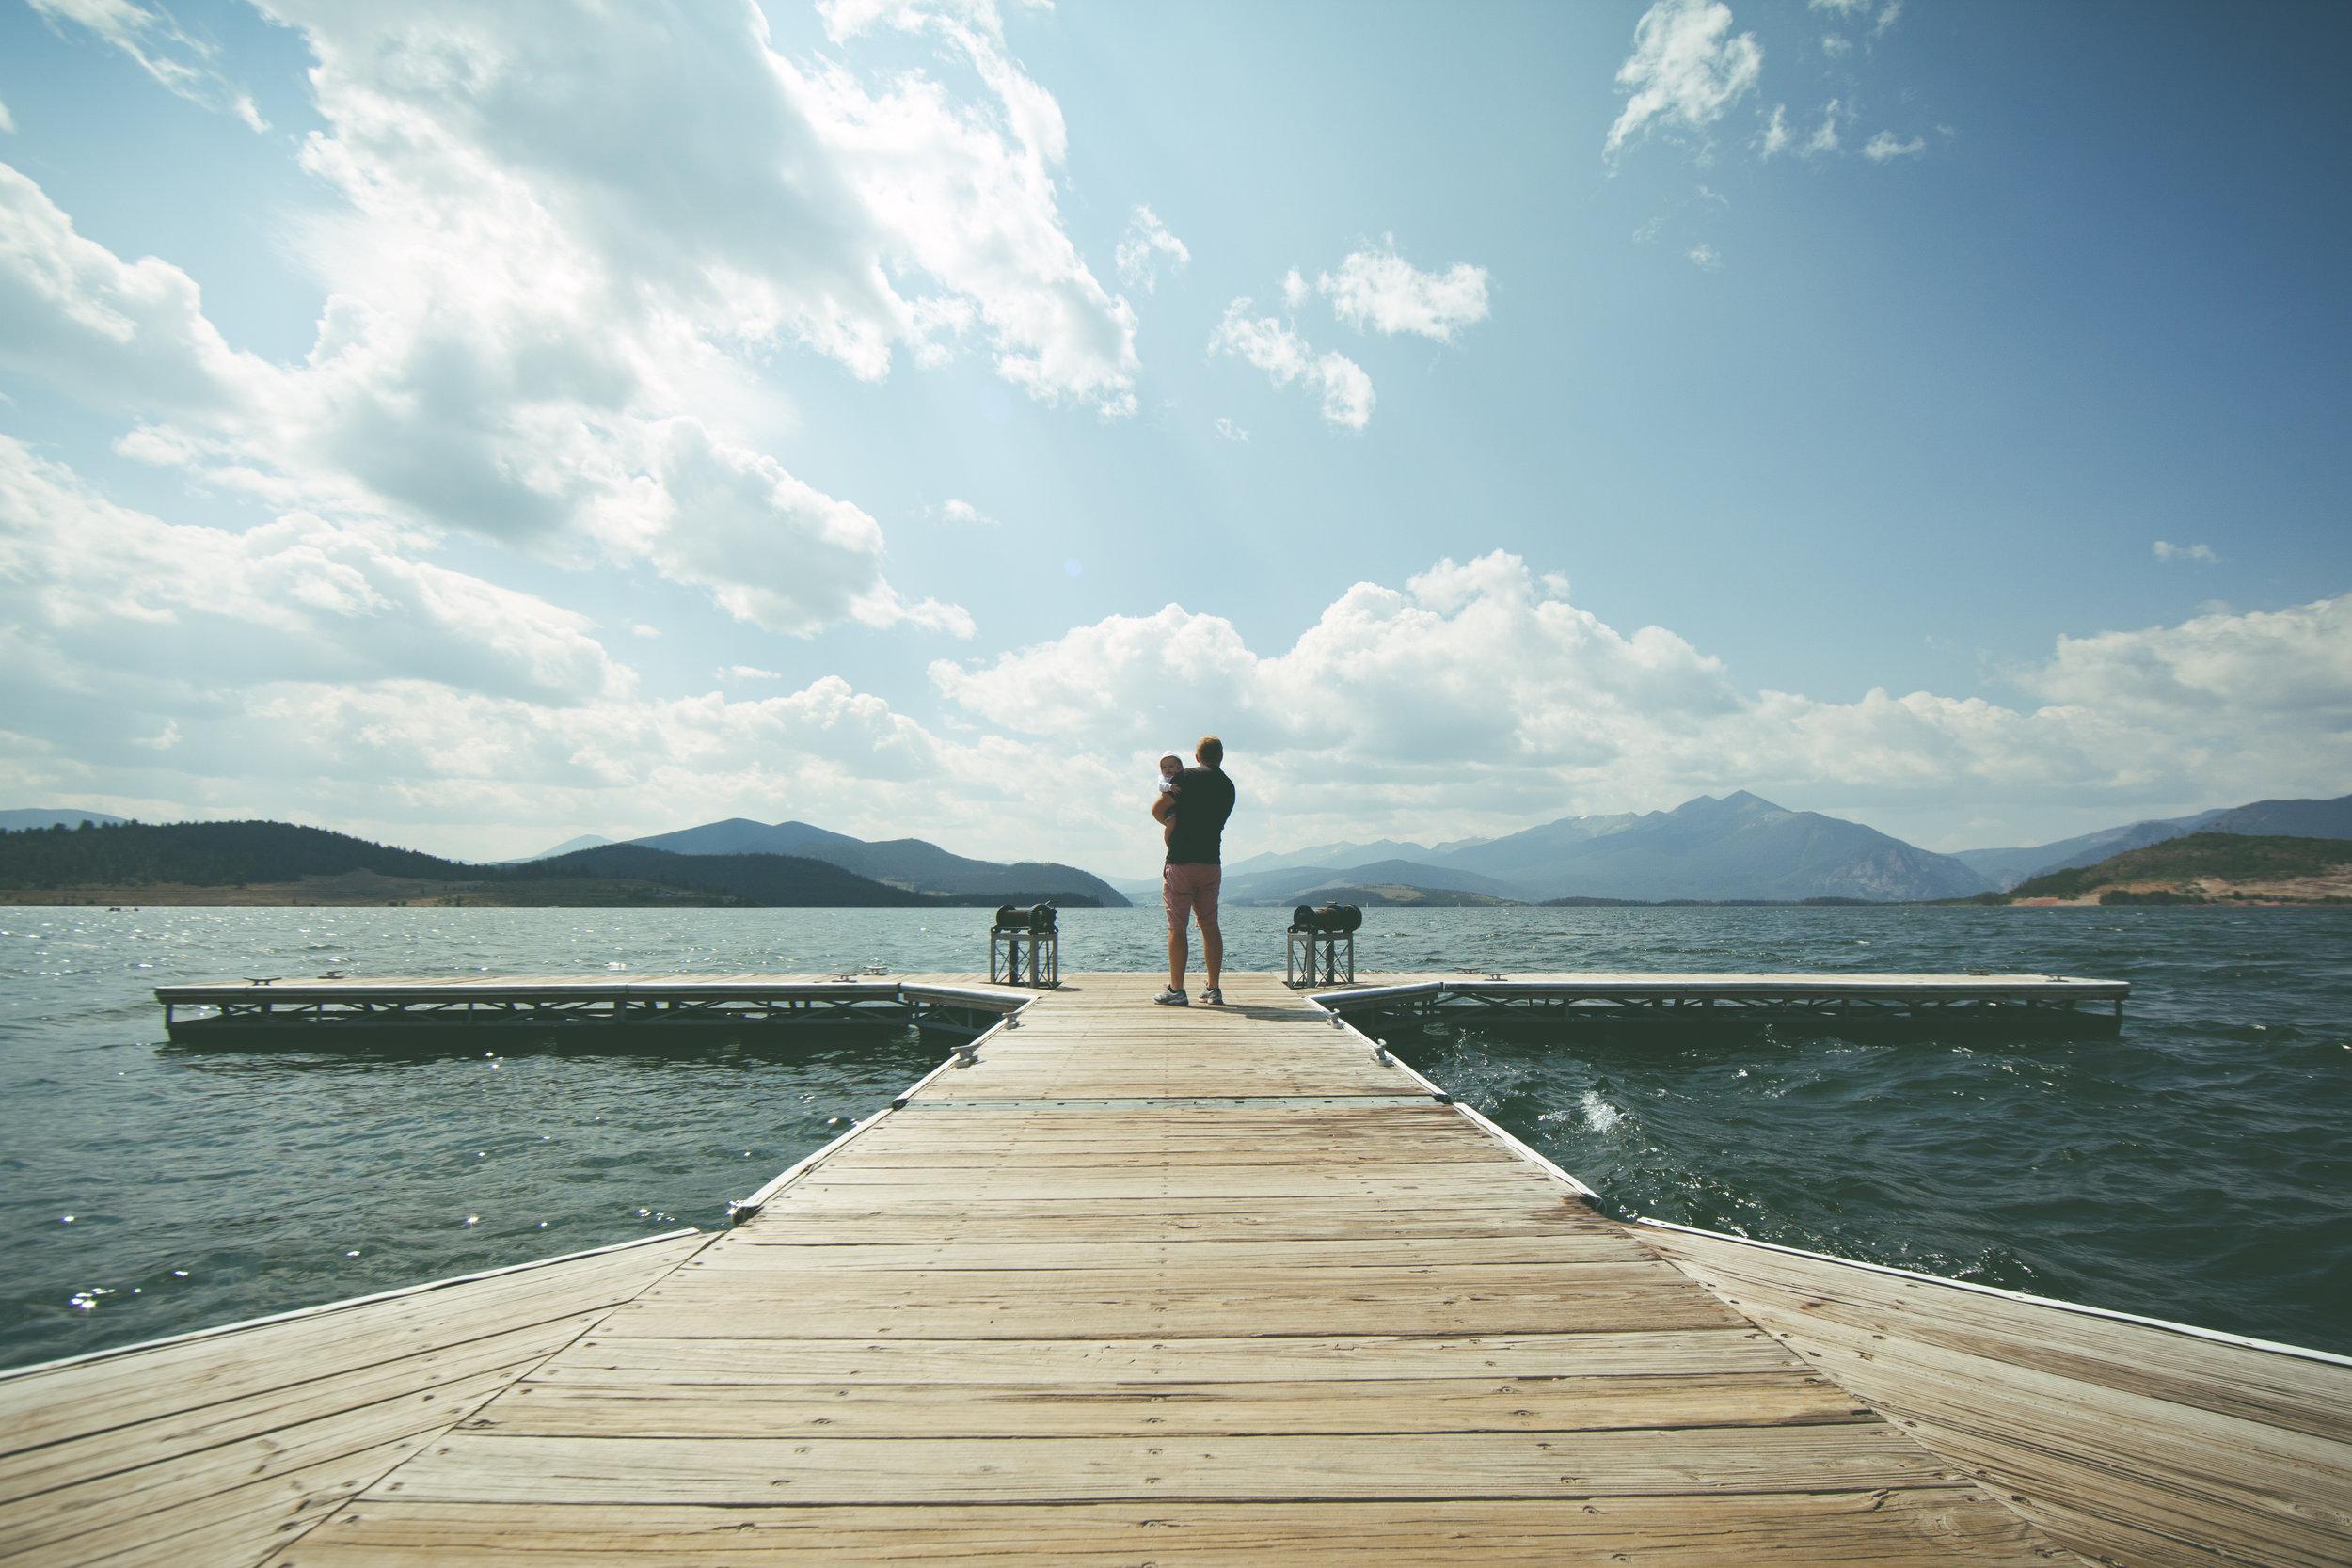 **dad baby dock water mountain landscape - INHERIT-BENEFICIARY StockSnap_HRPBX2ENGR.jpg